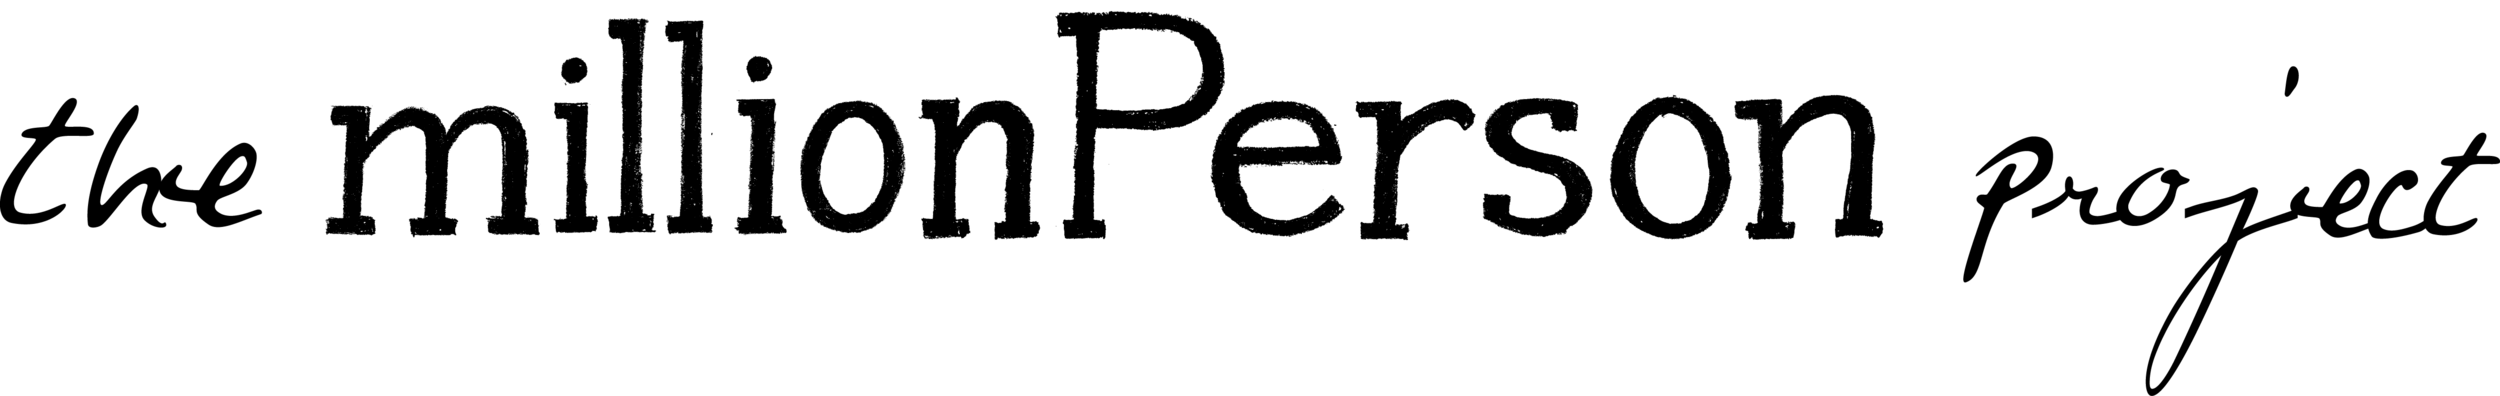 LogoLong.png